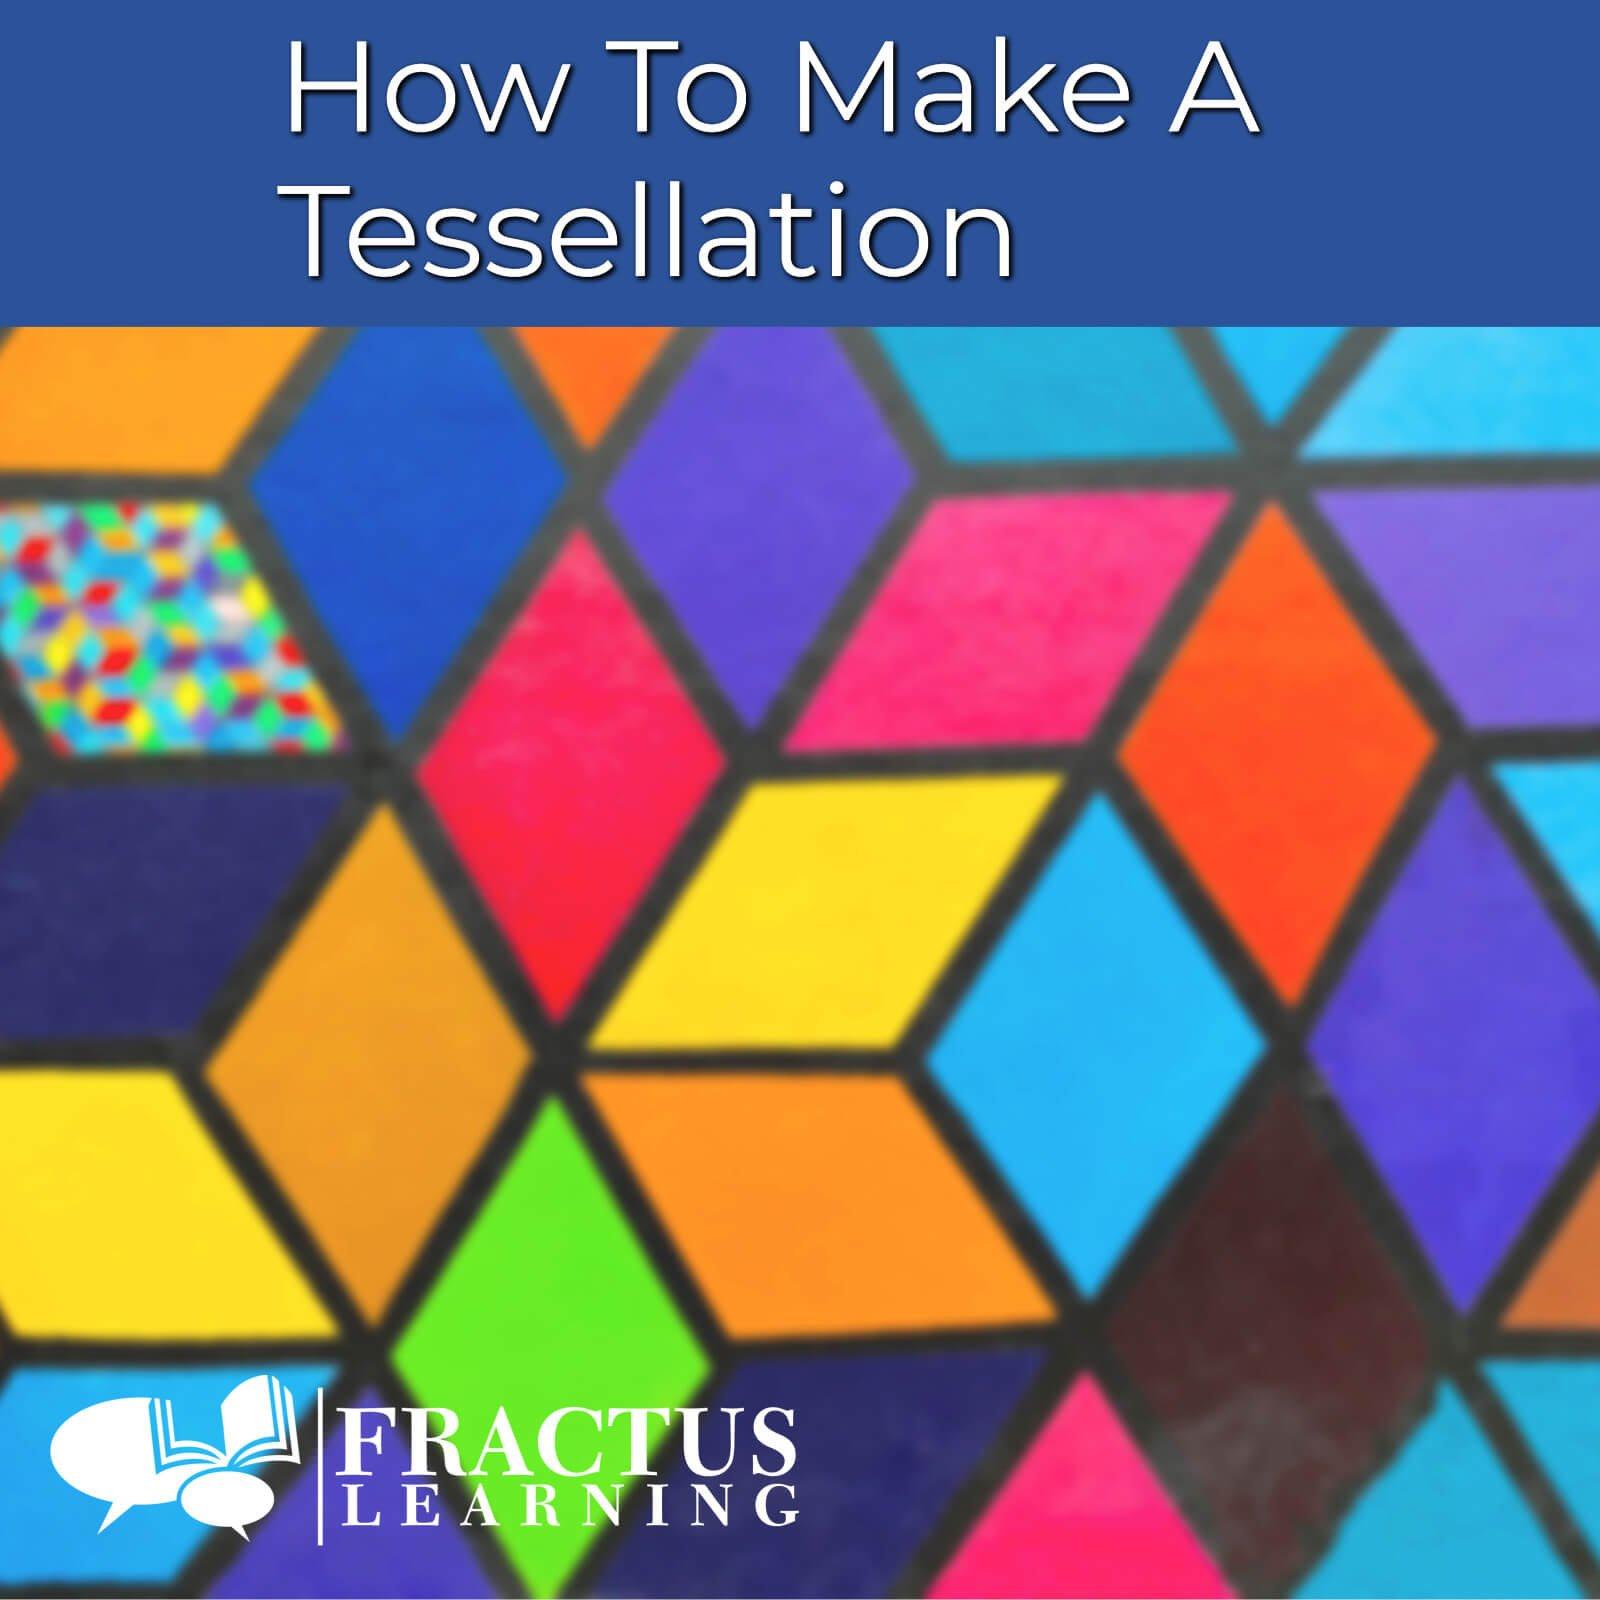 how to make a tessellation - tessellation ideas - translation math definition